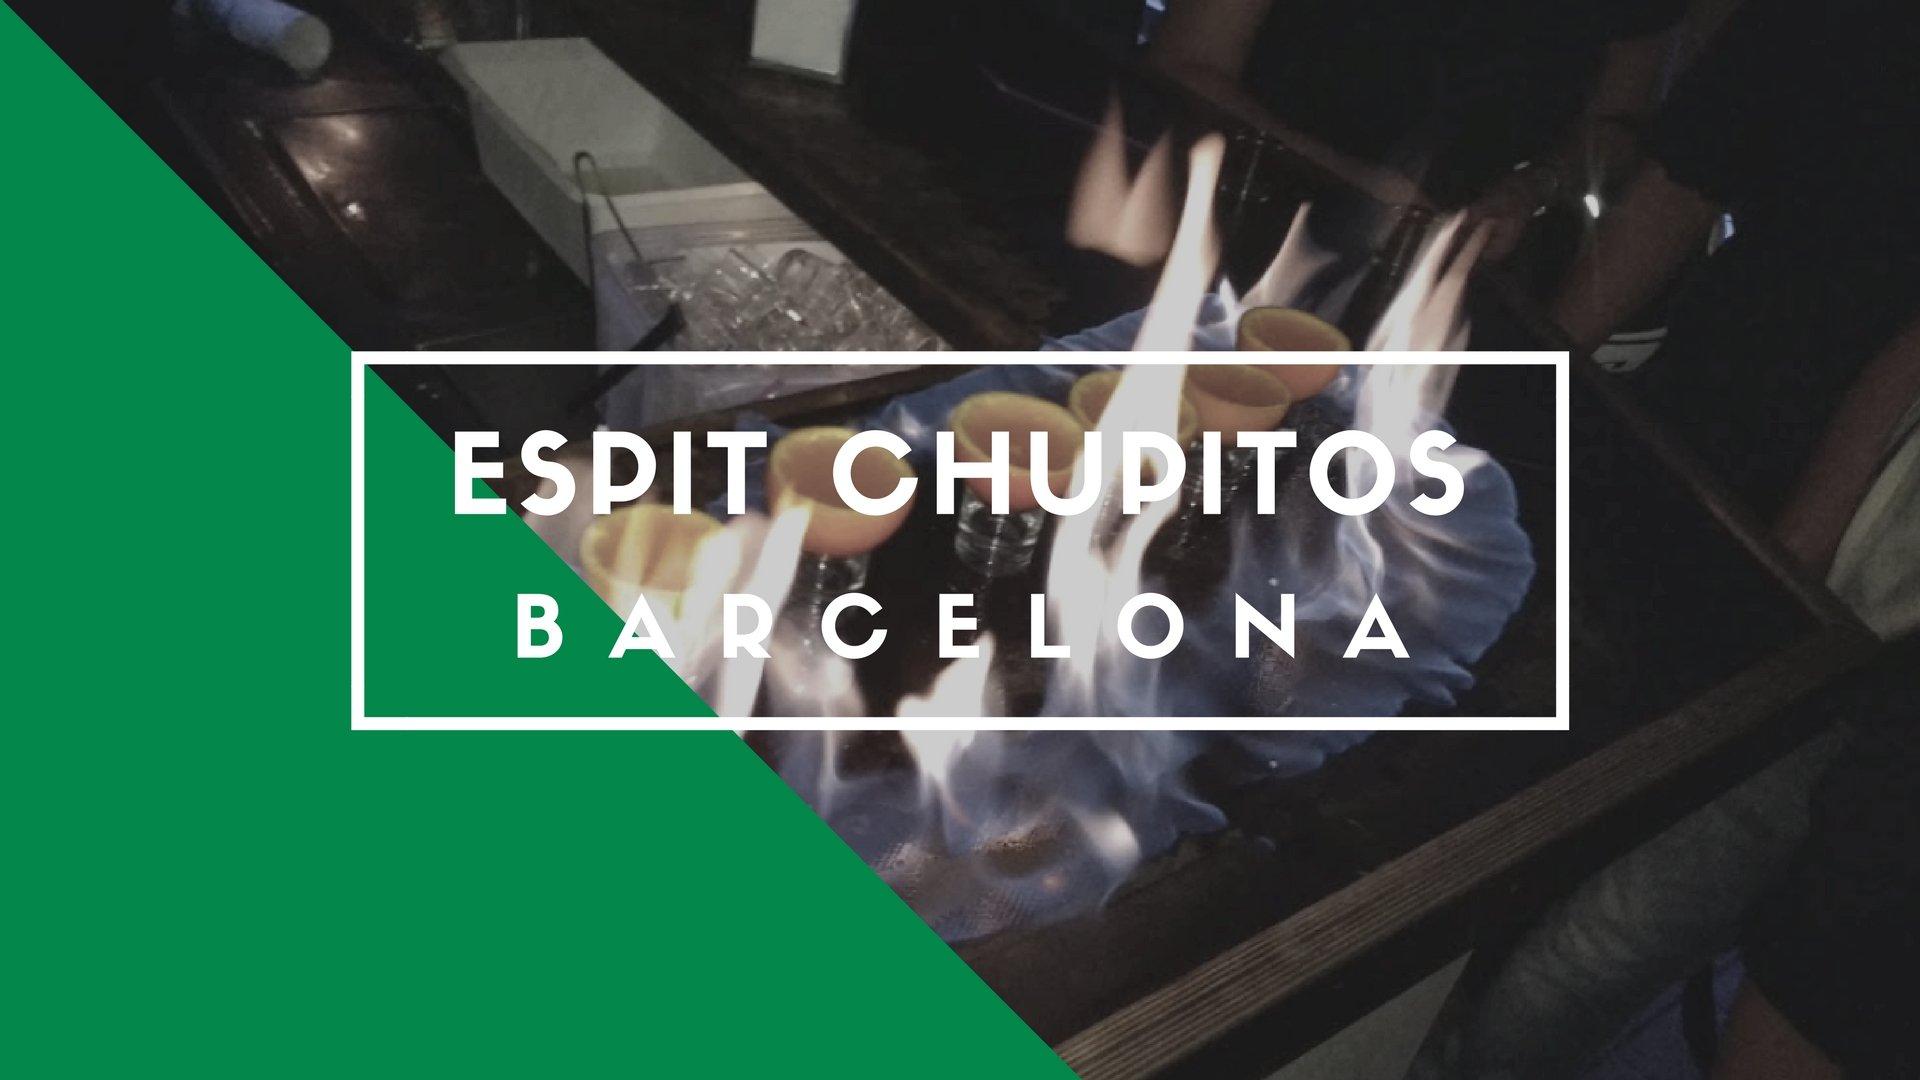 Espit Chupitos, Barcelona